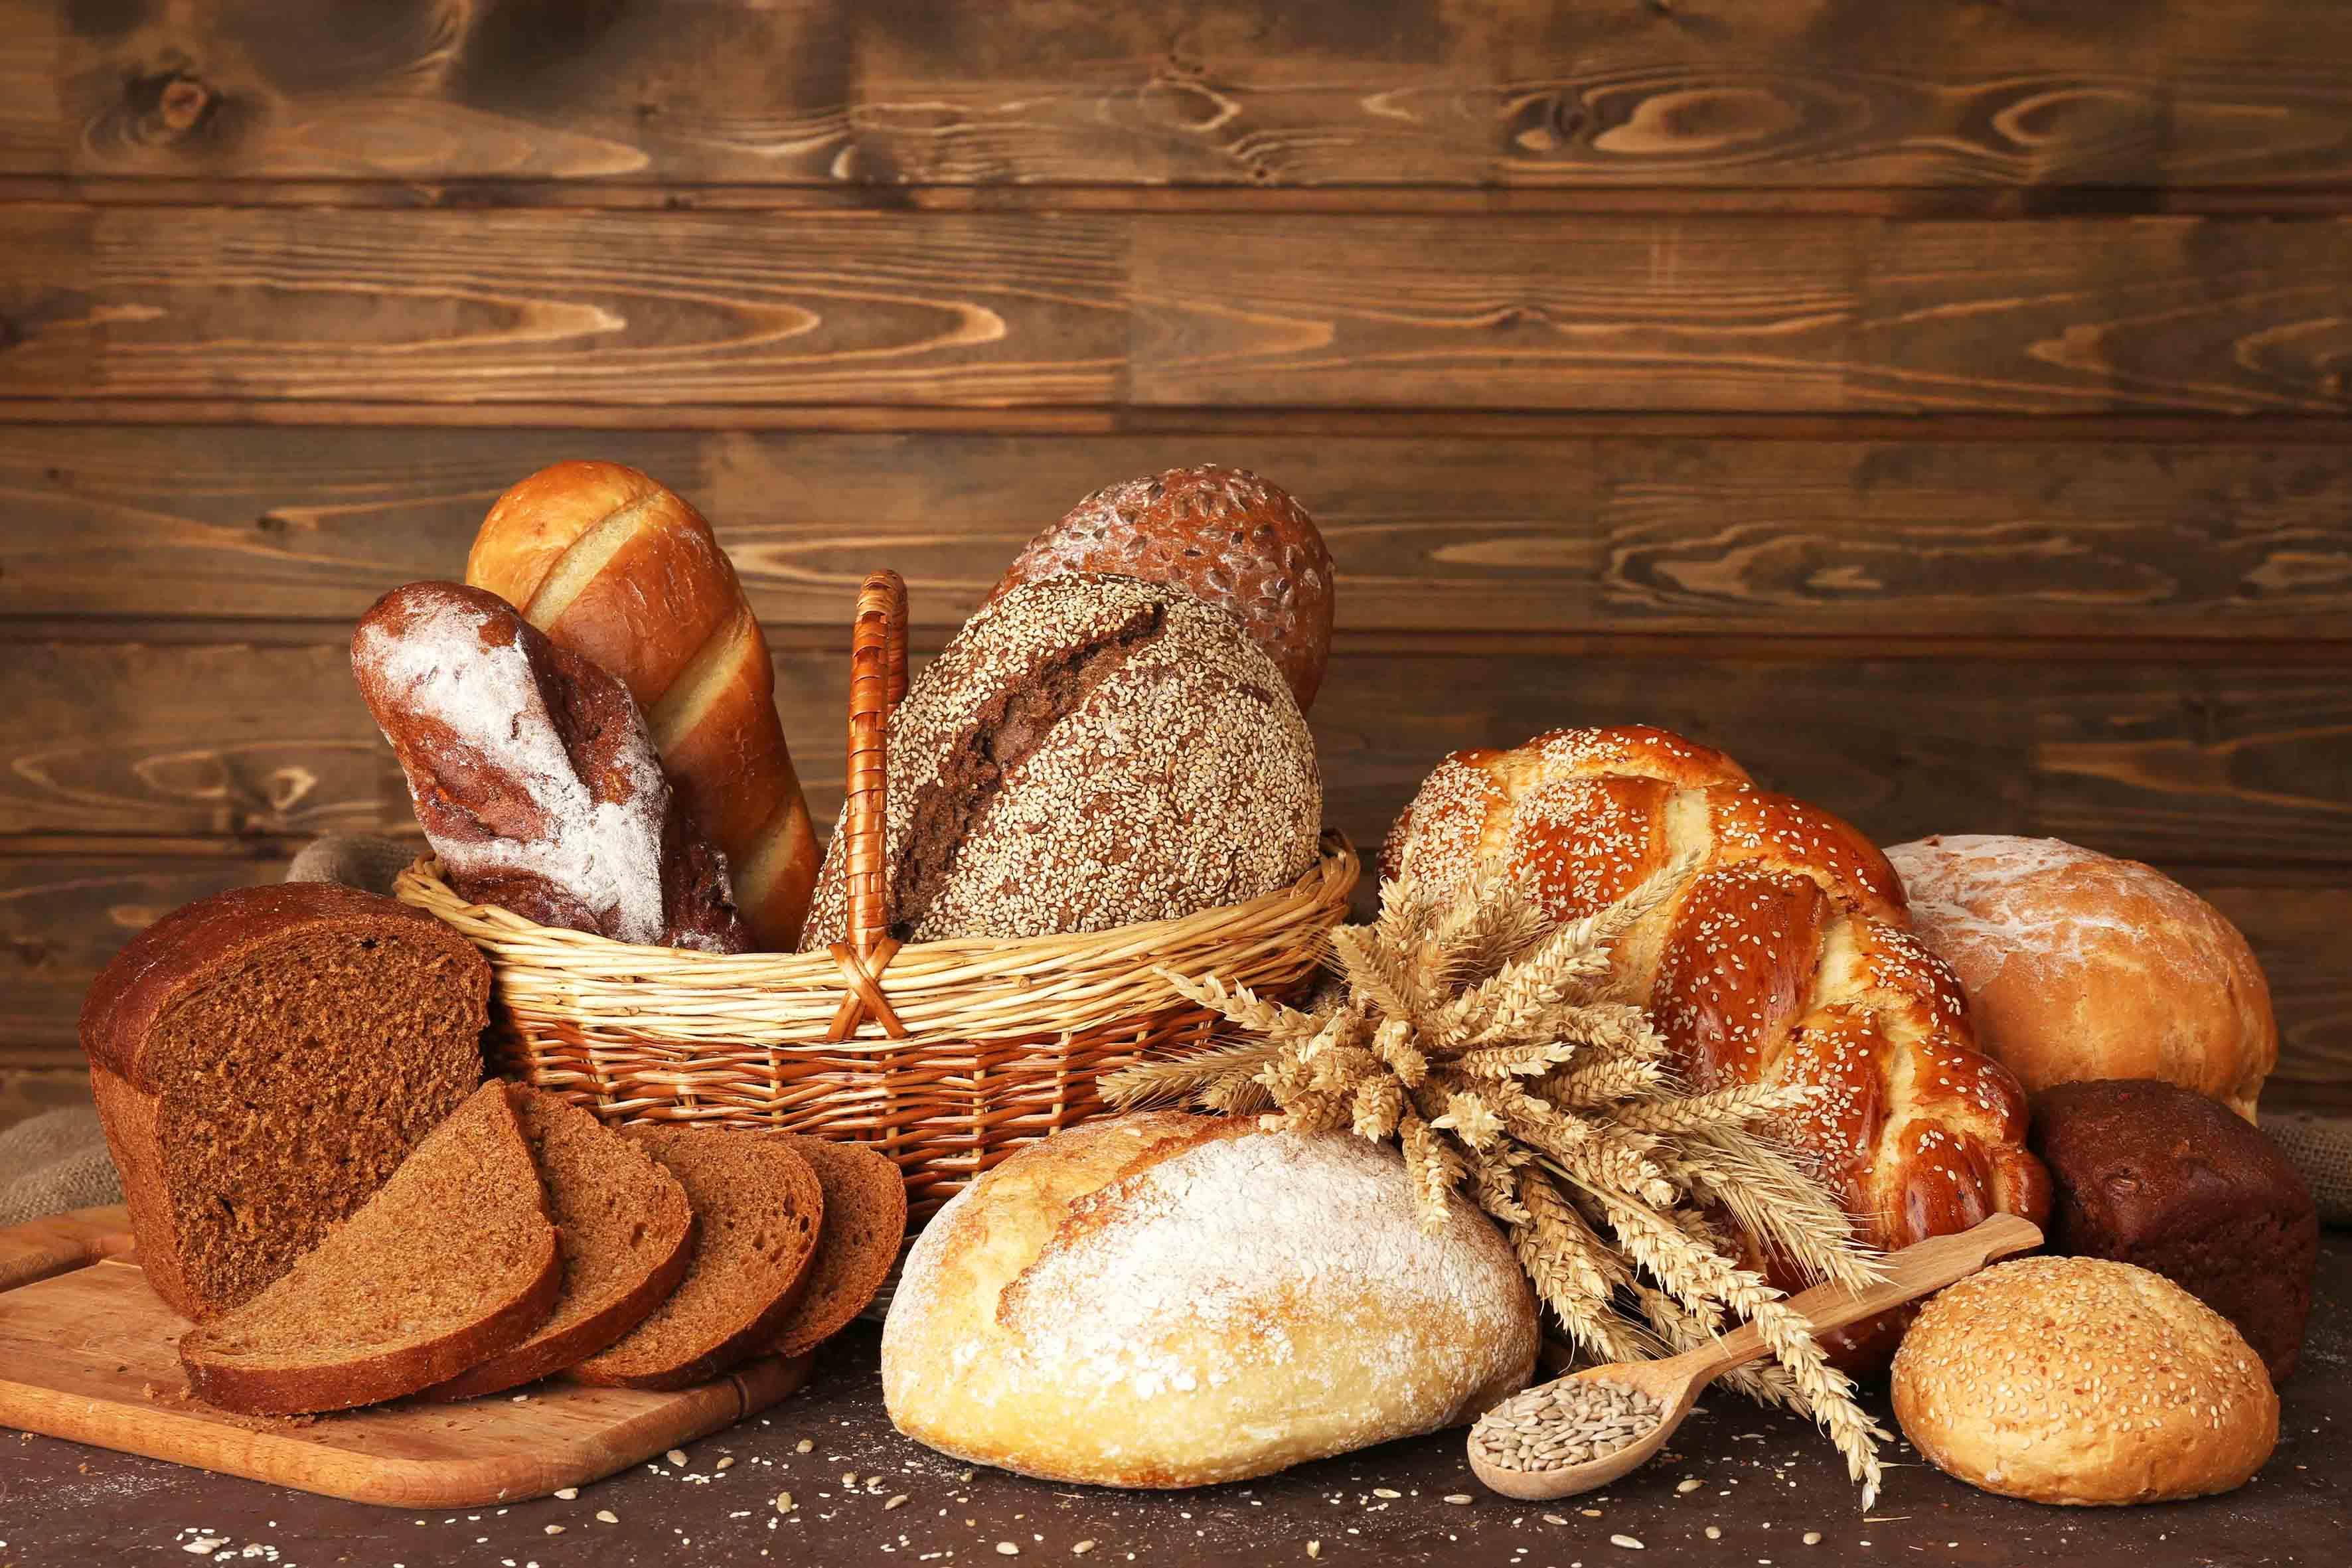 Der Tag ist im Lot – mit EDEKA Brot